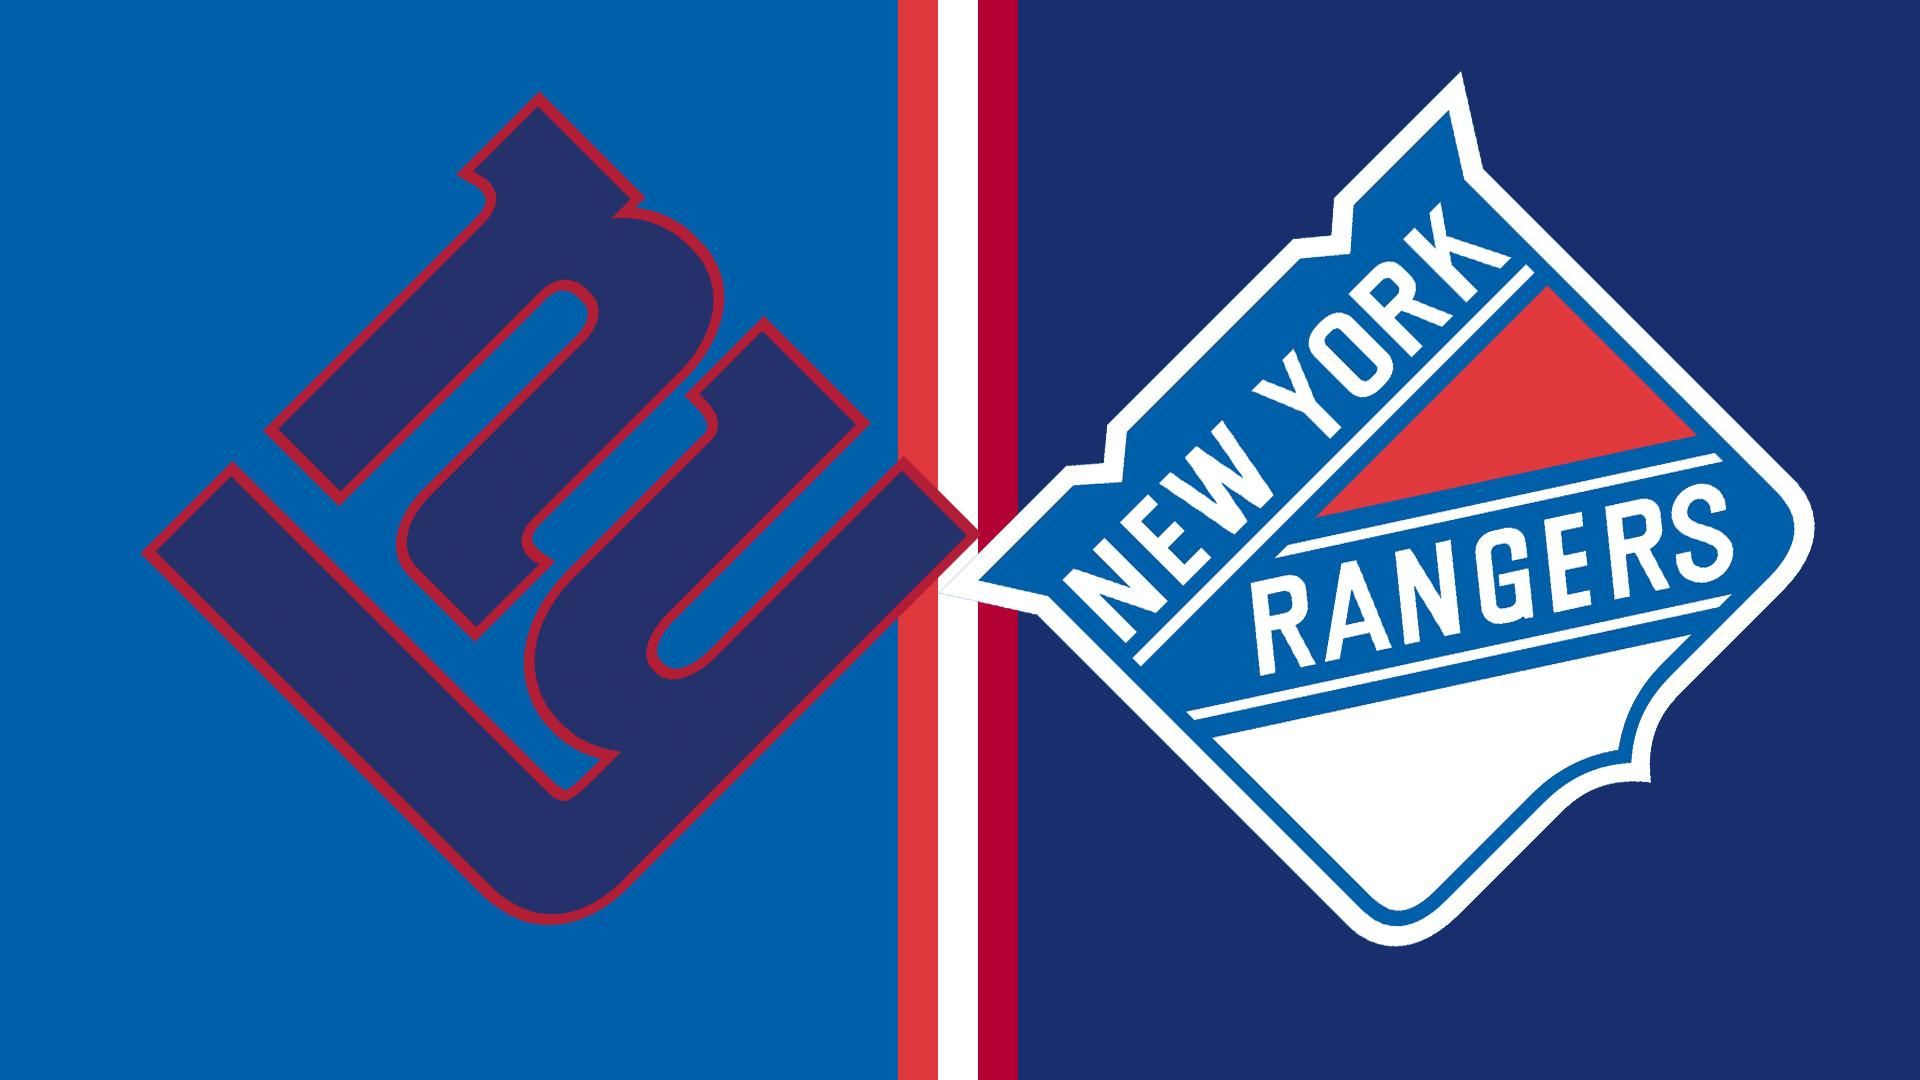 1920x1080 NEW YORK RANGERS hockey nhl (80) wallpaper | 1920x1080 | 359481 | WallpaperUP